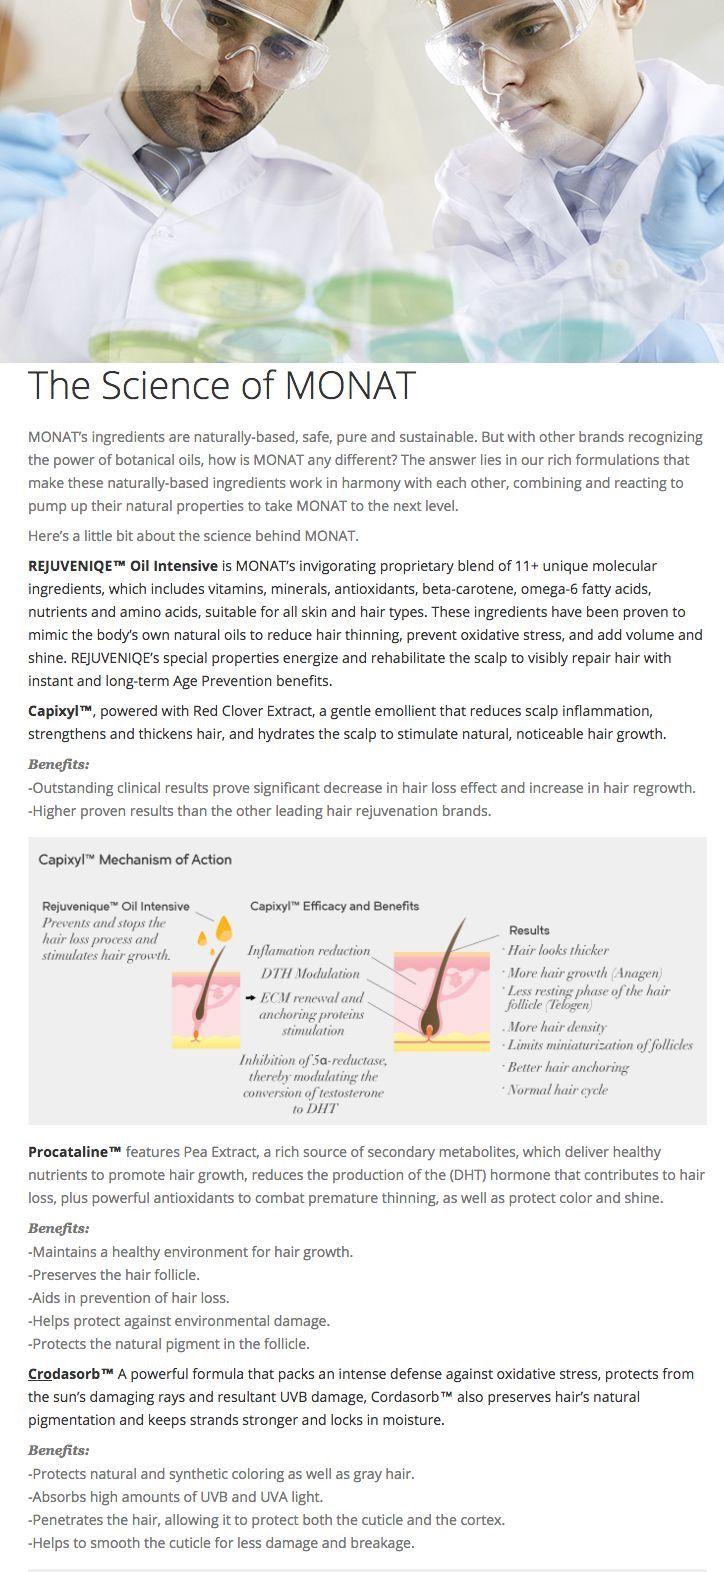 Science Behind Monat Monat Hair Monat Monat Ingredients